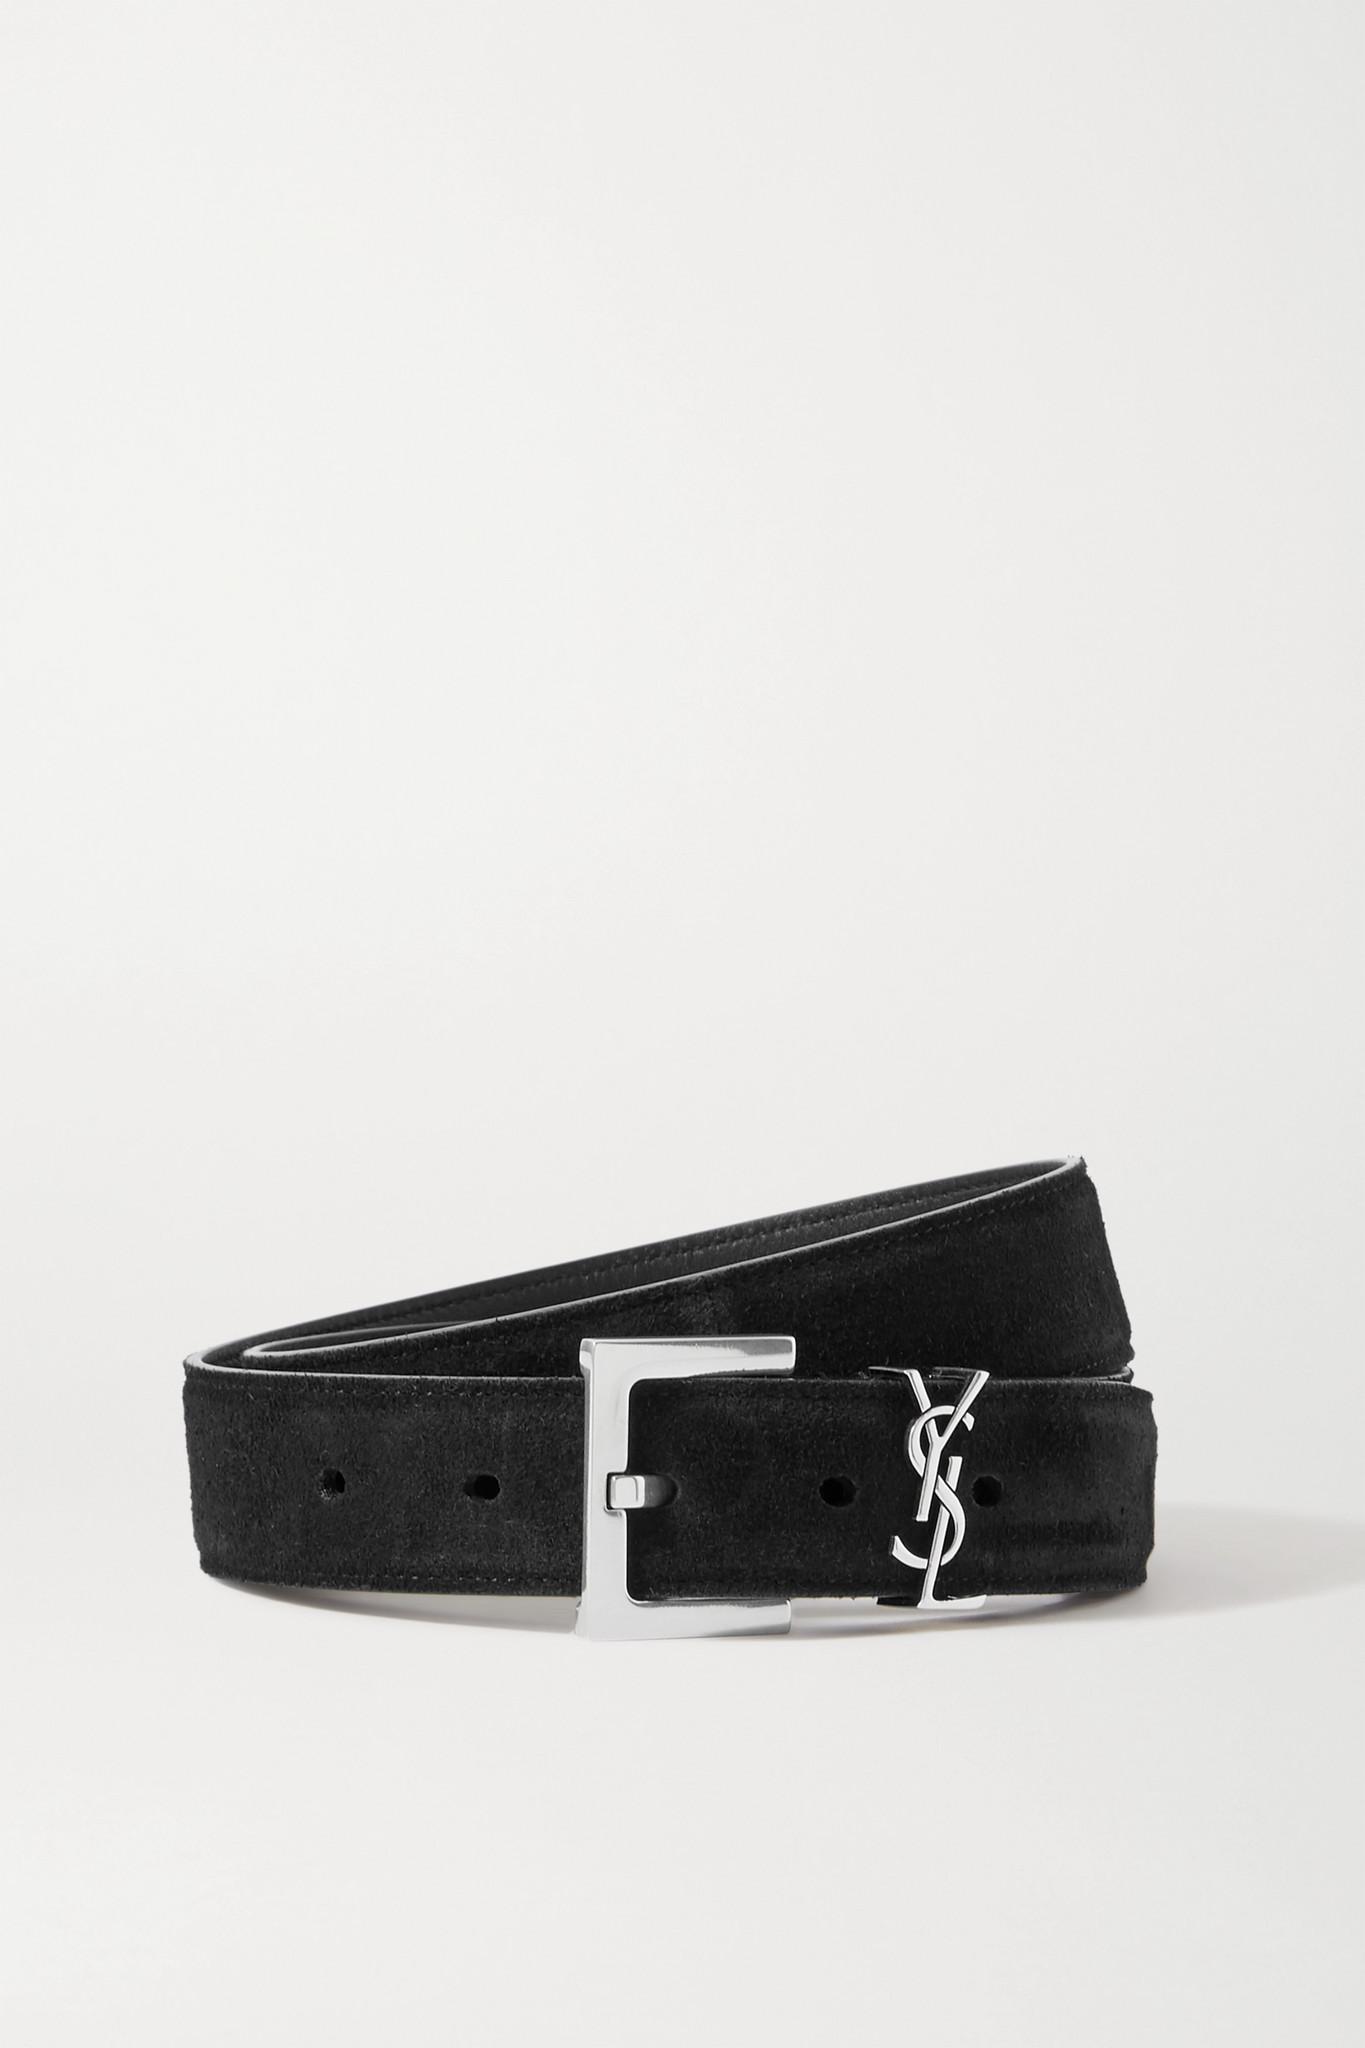 SAINT LAURENT - Monogramme 绒面革腰带 - 黑色 - 90